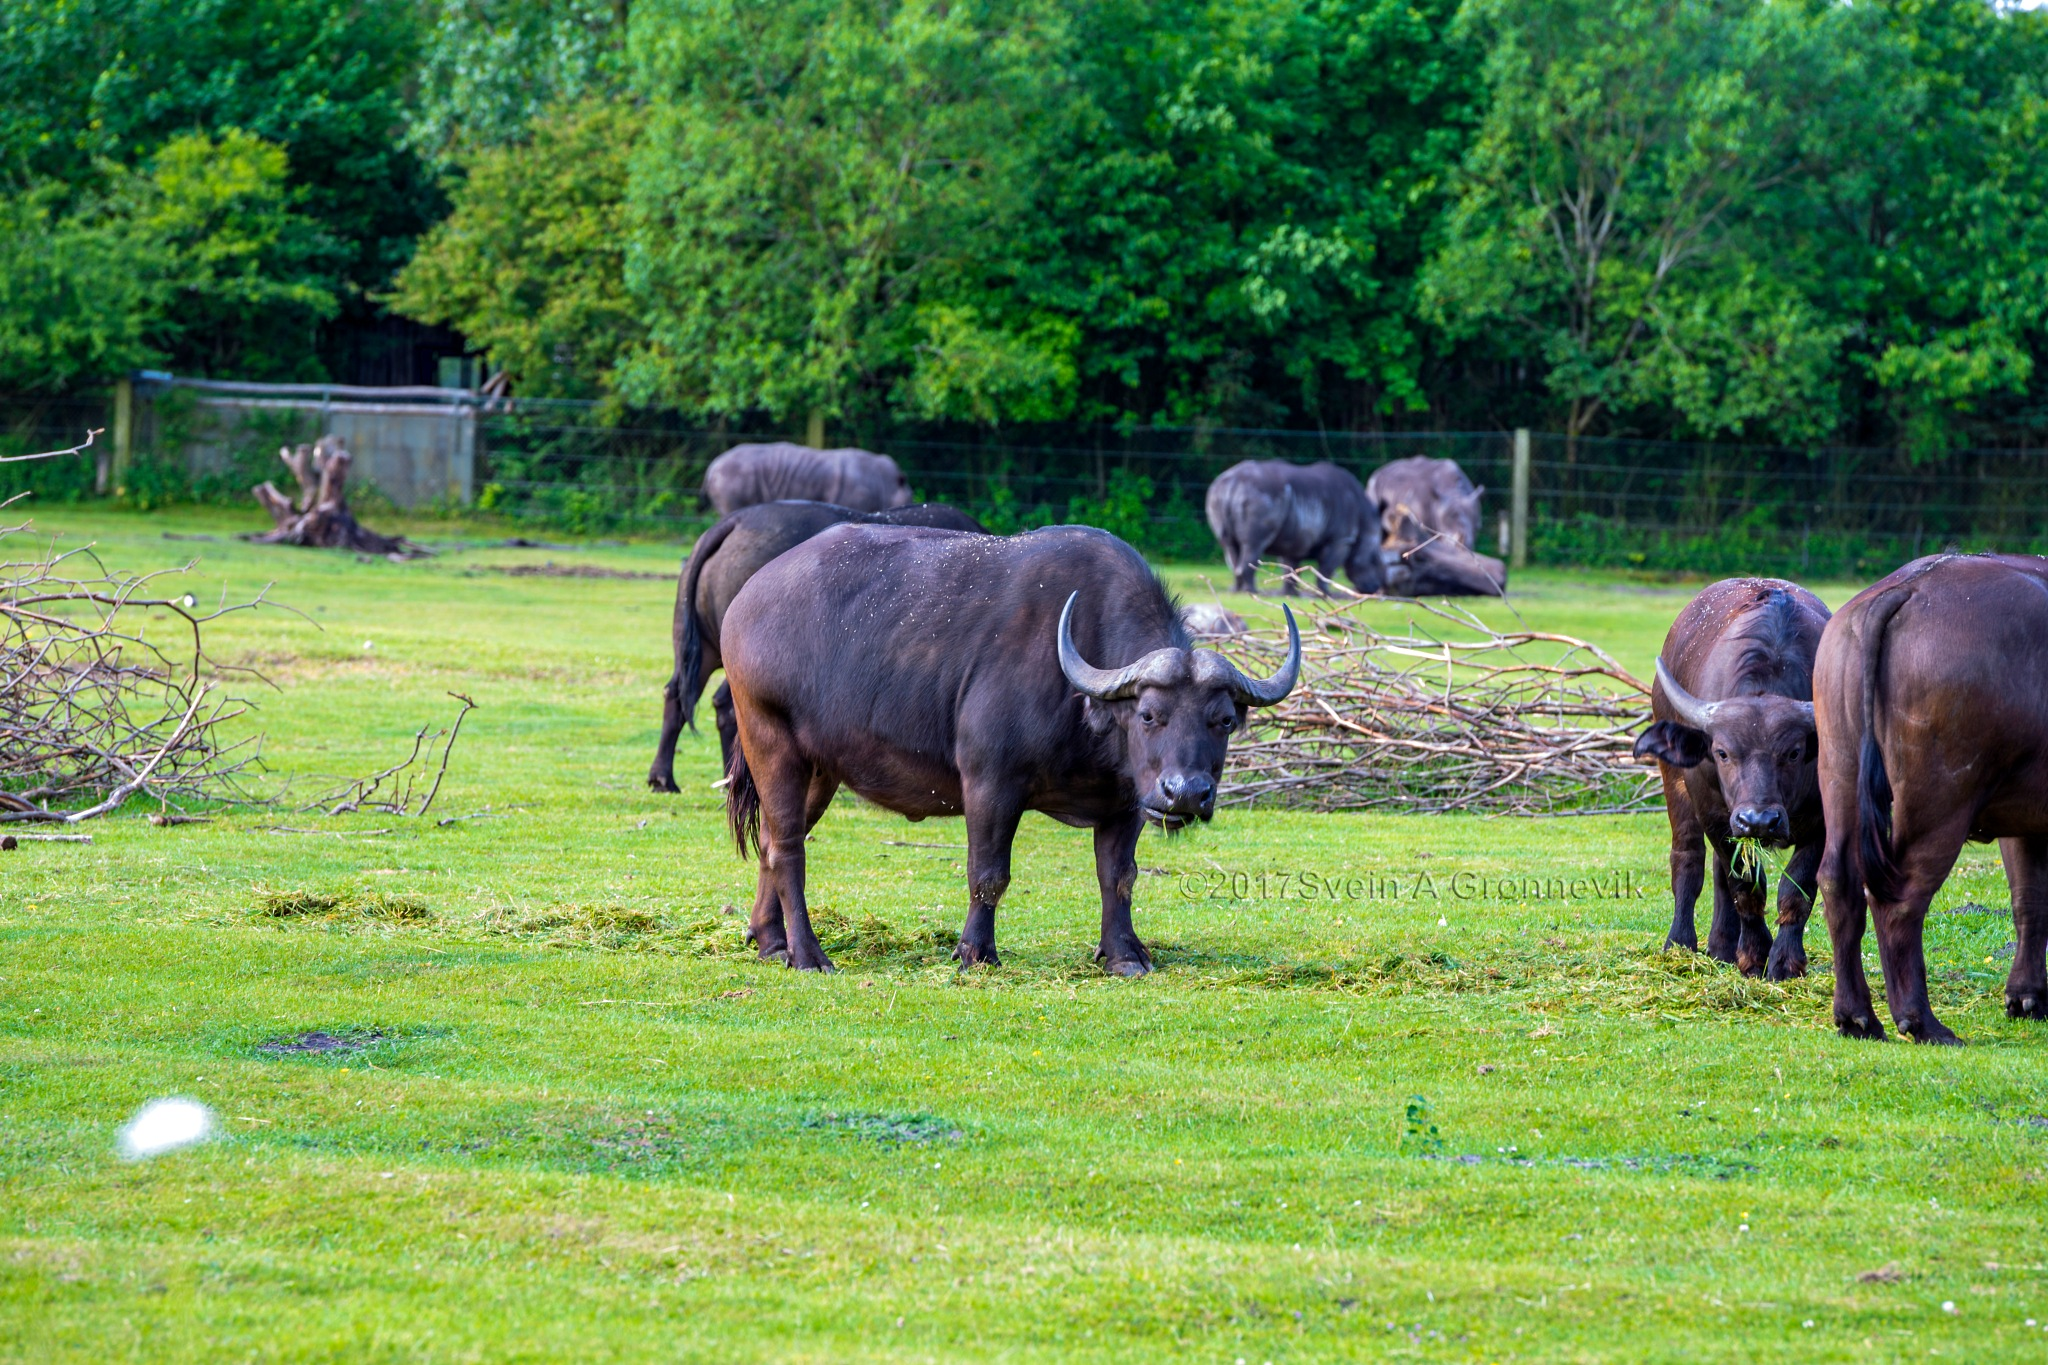 Buffalo by Svein Arne Grønnevik